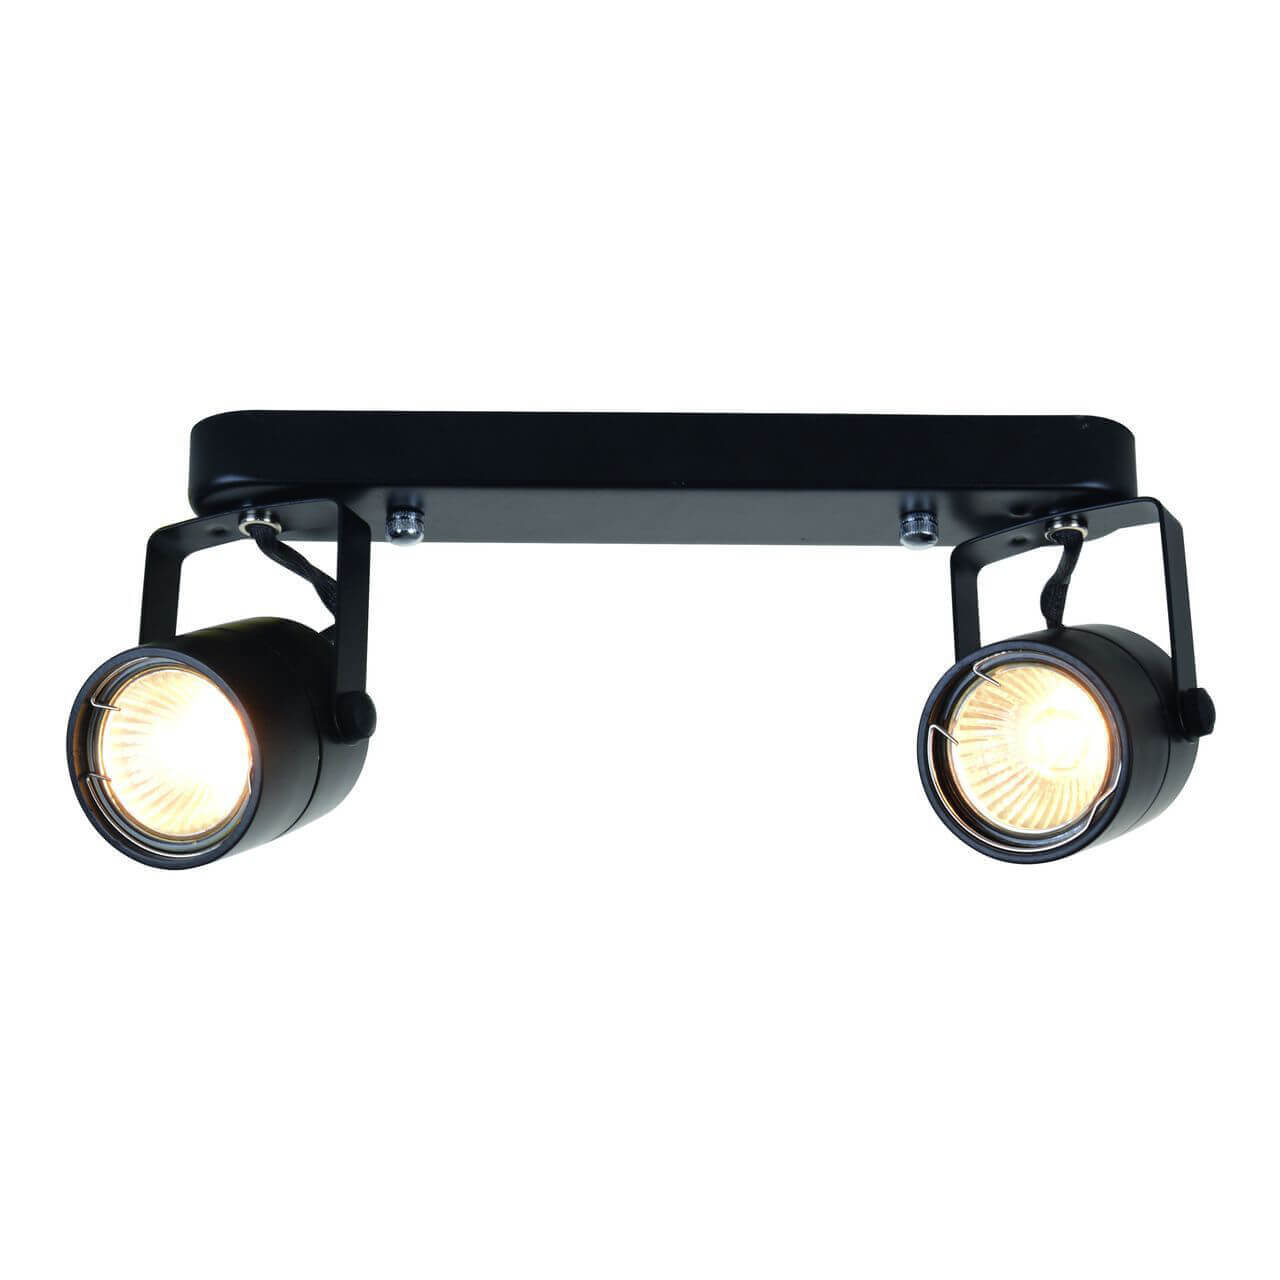 Спот Arte Lamp A1310PL-2BK Lente Black недорого